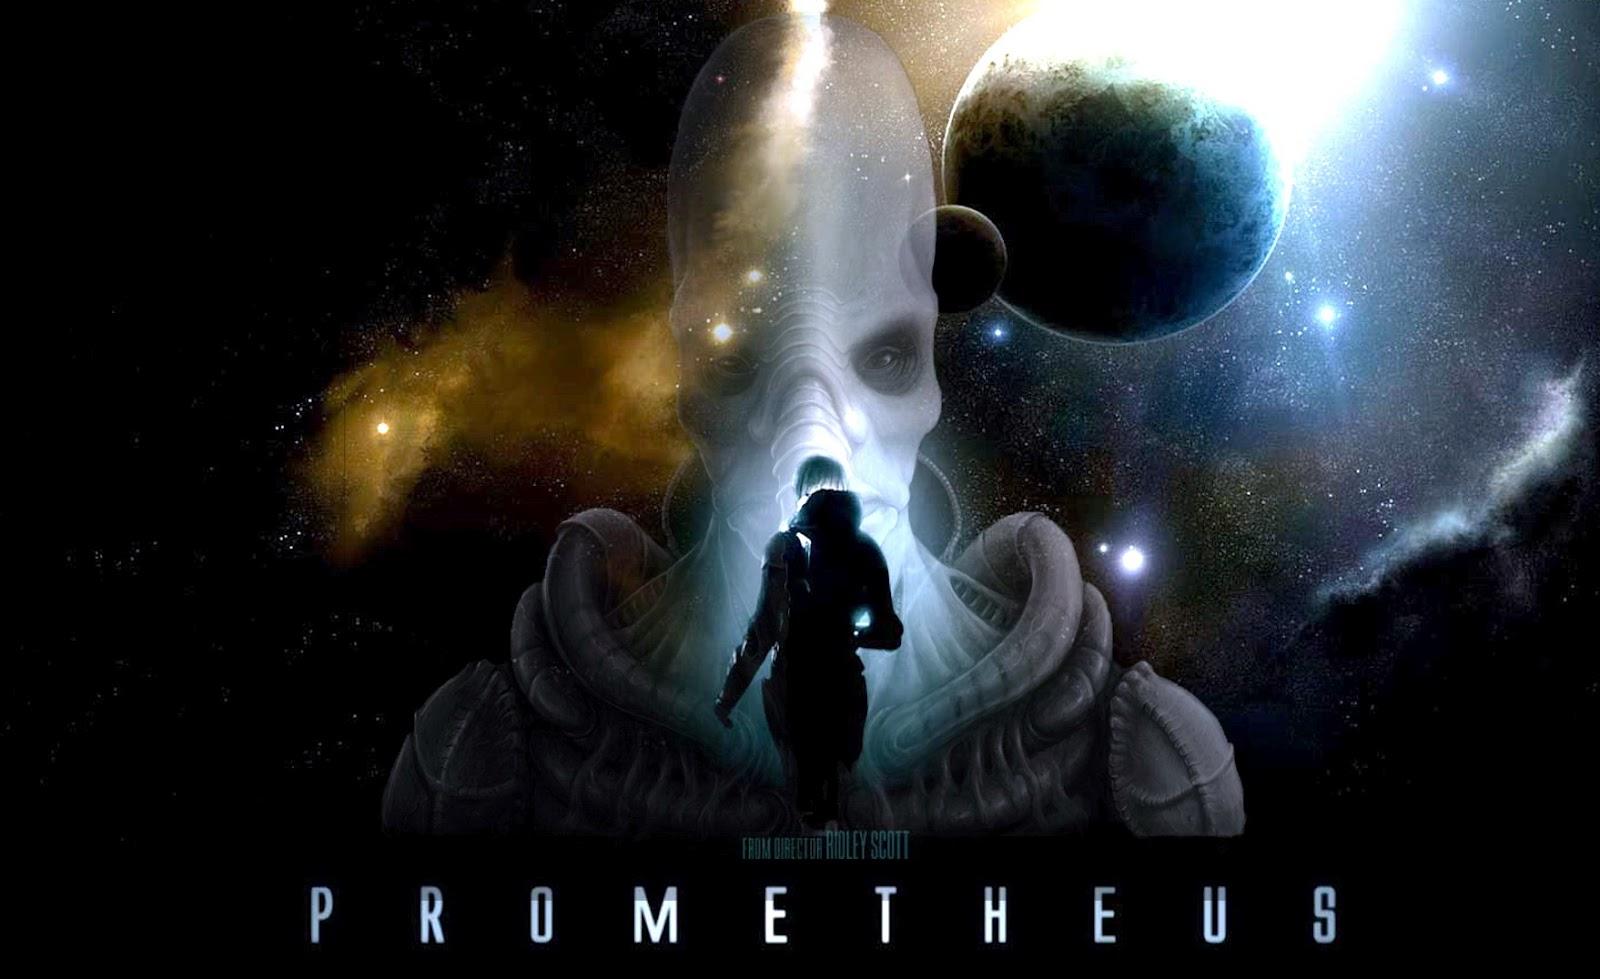 http://4.bp.blogspot.com/-IjhY9Sebt_4/T87bP78pZUI/AAAAAAAAI4Q/WBsAwONOHOU/s1600/Prometheus-movie-Ridley-Scott.jpg